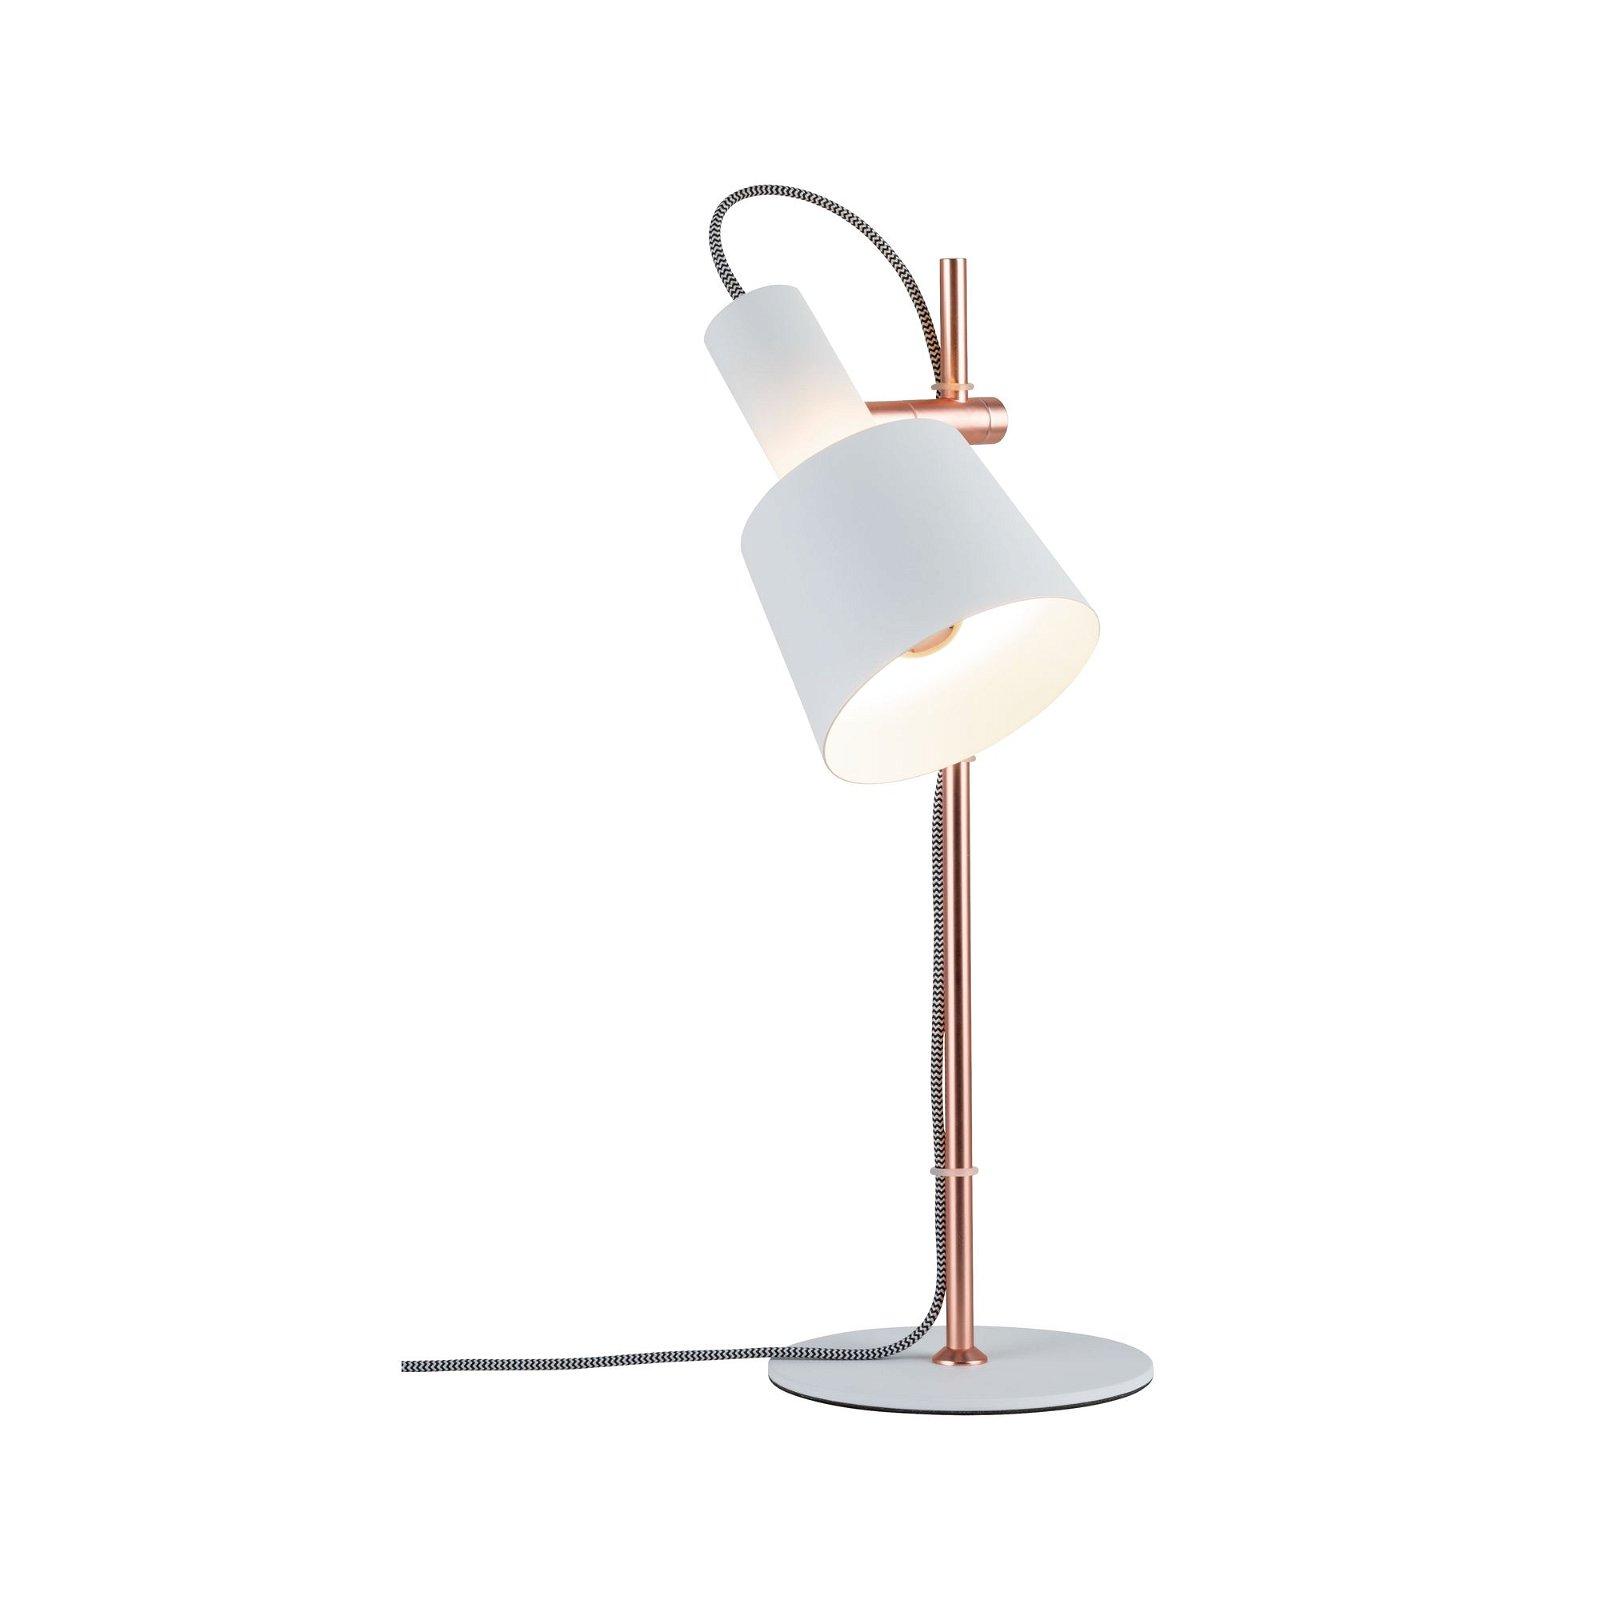 Neordic Table luminaire Haldar E14 max. 20W White/Matt copper Metal